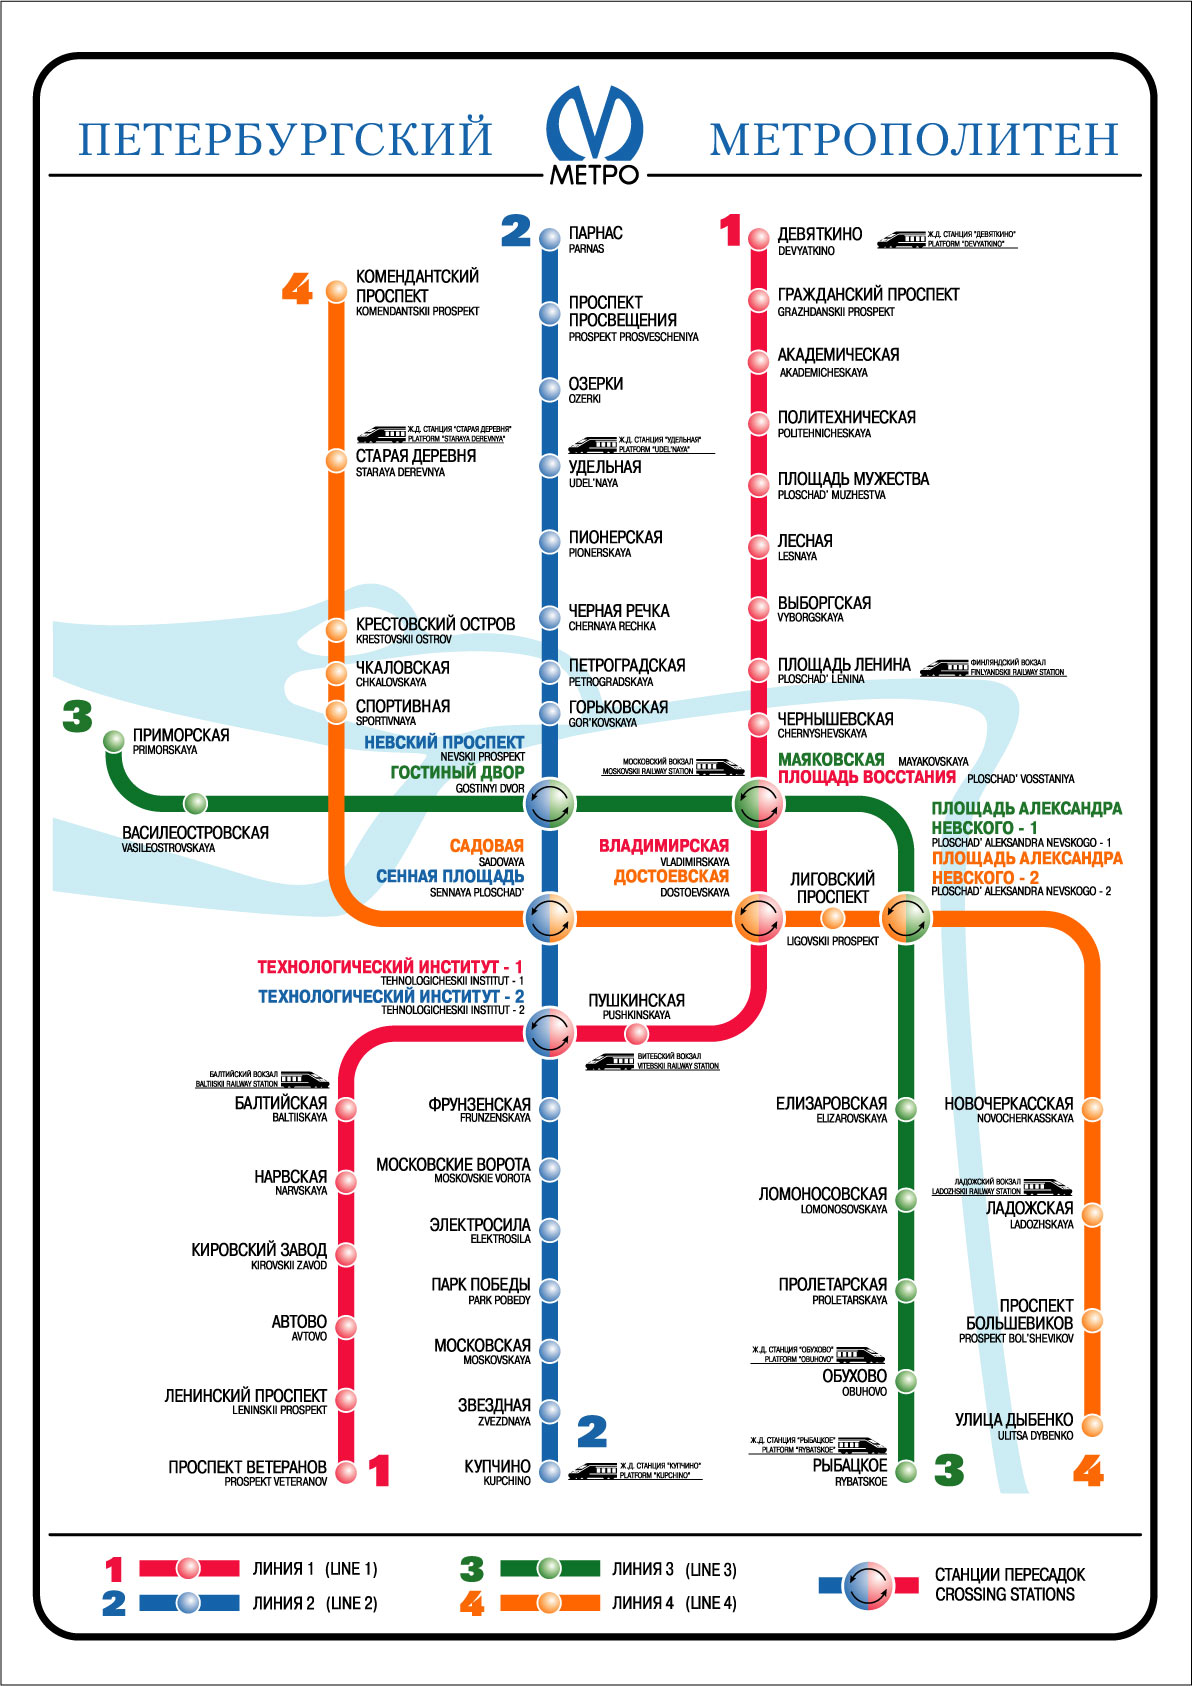 Схема Метрополитена Санкт-Петербурга.